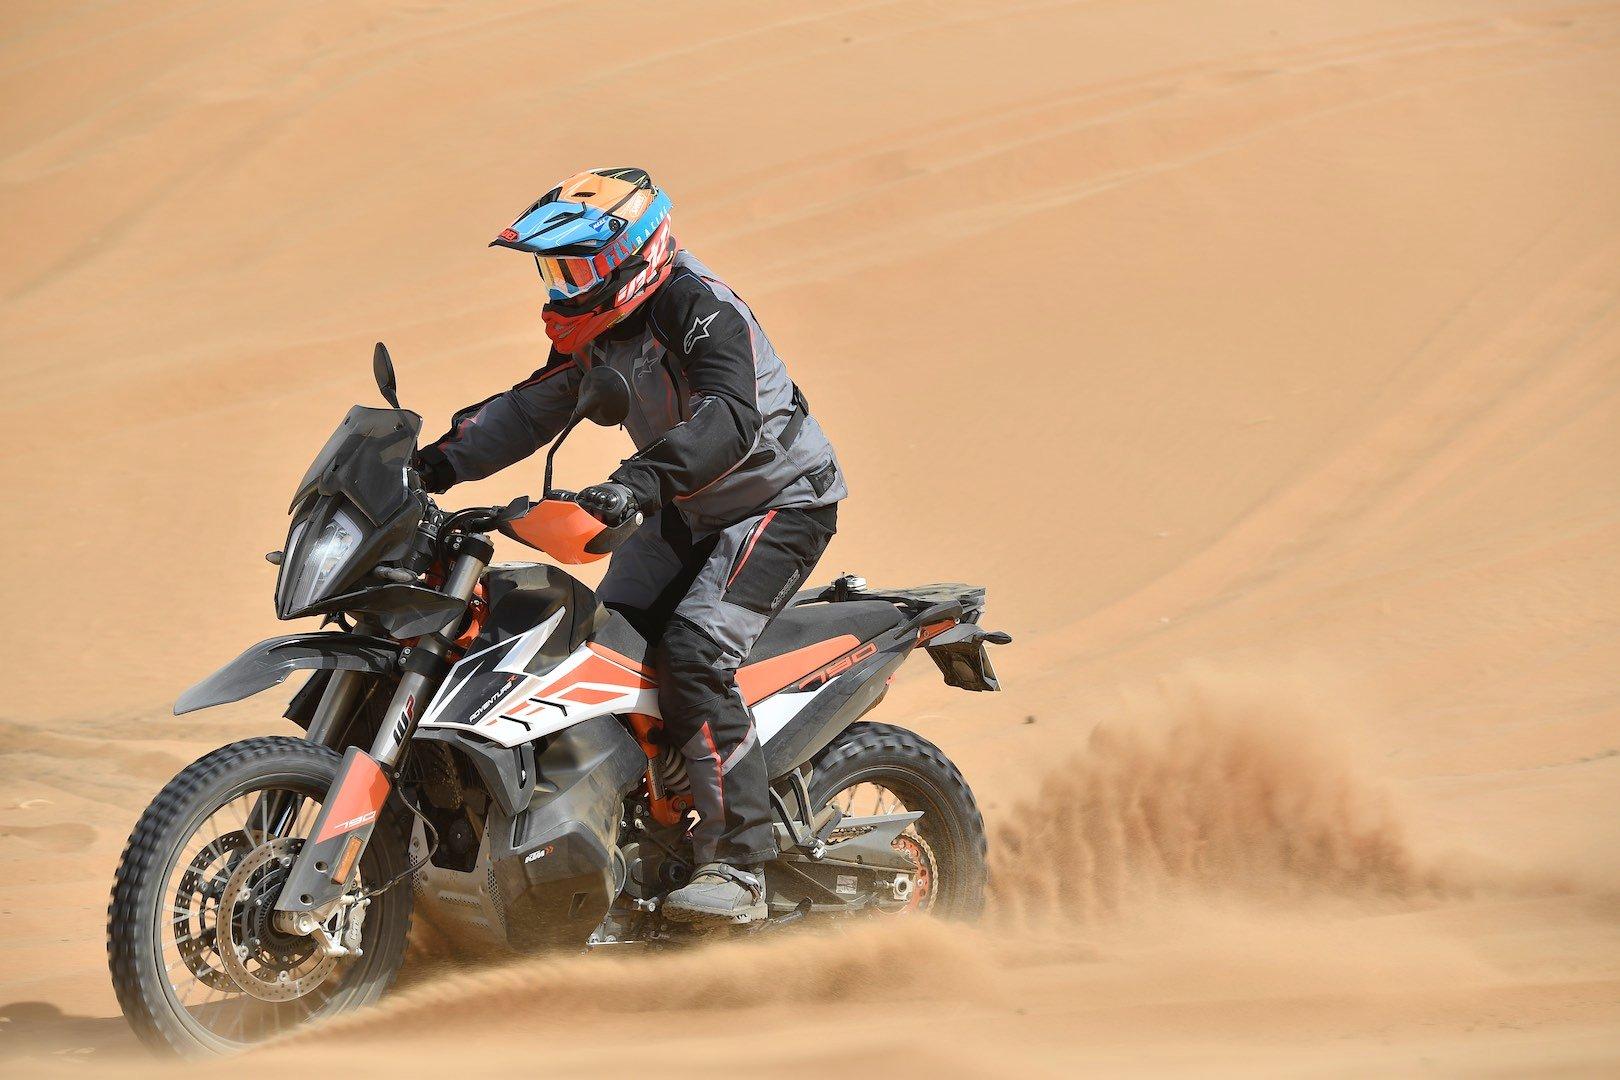 2019 KTM 790 Adventure sand